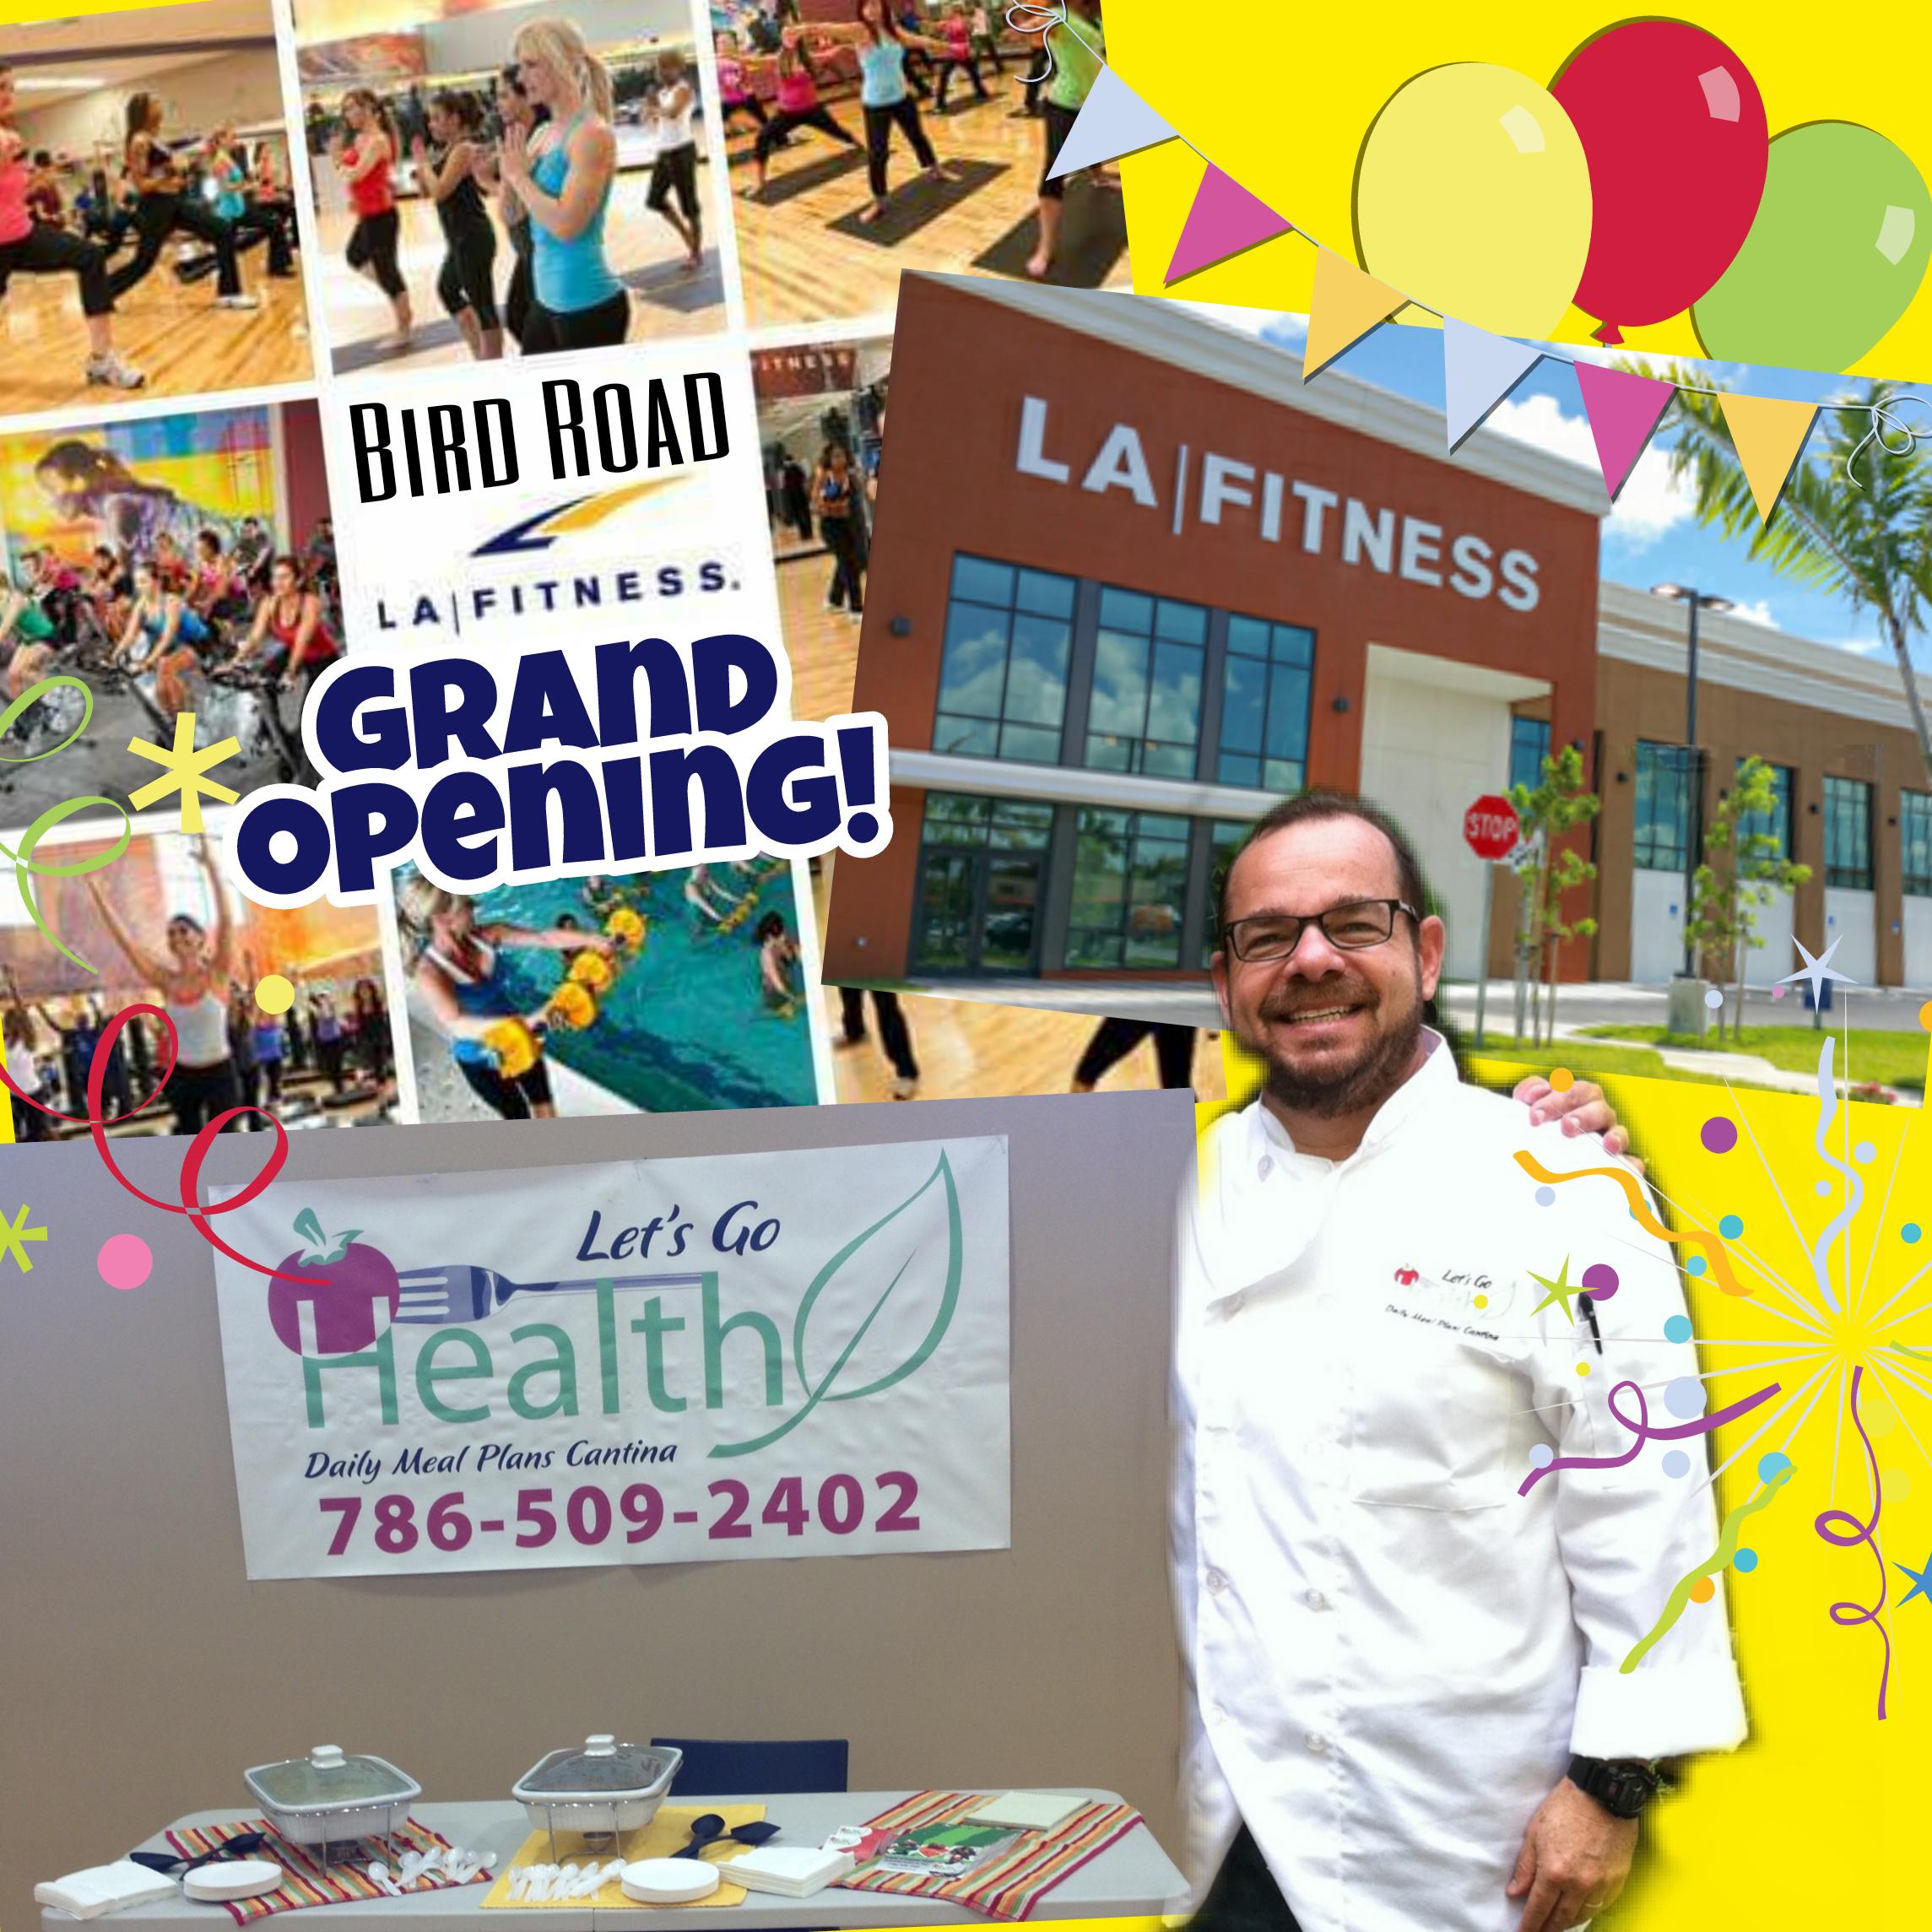 LA Fitness Grand Opening